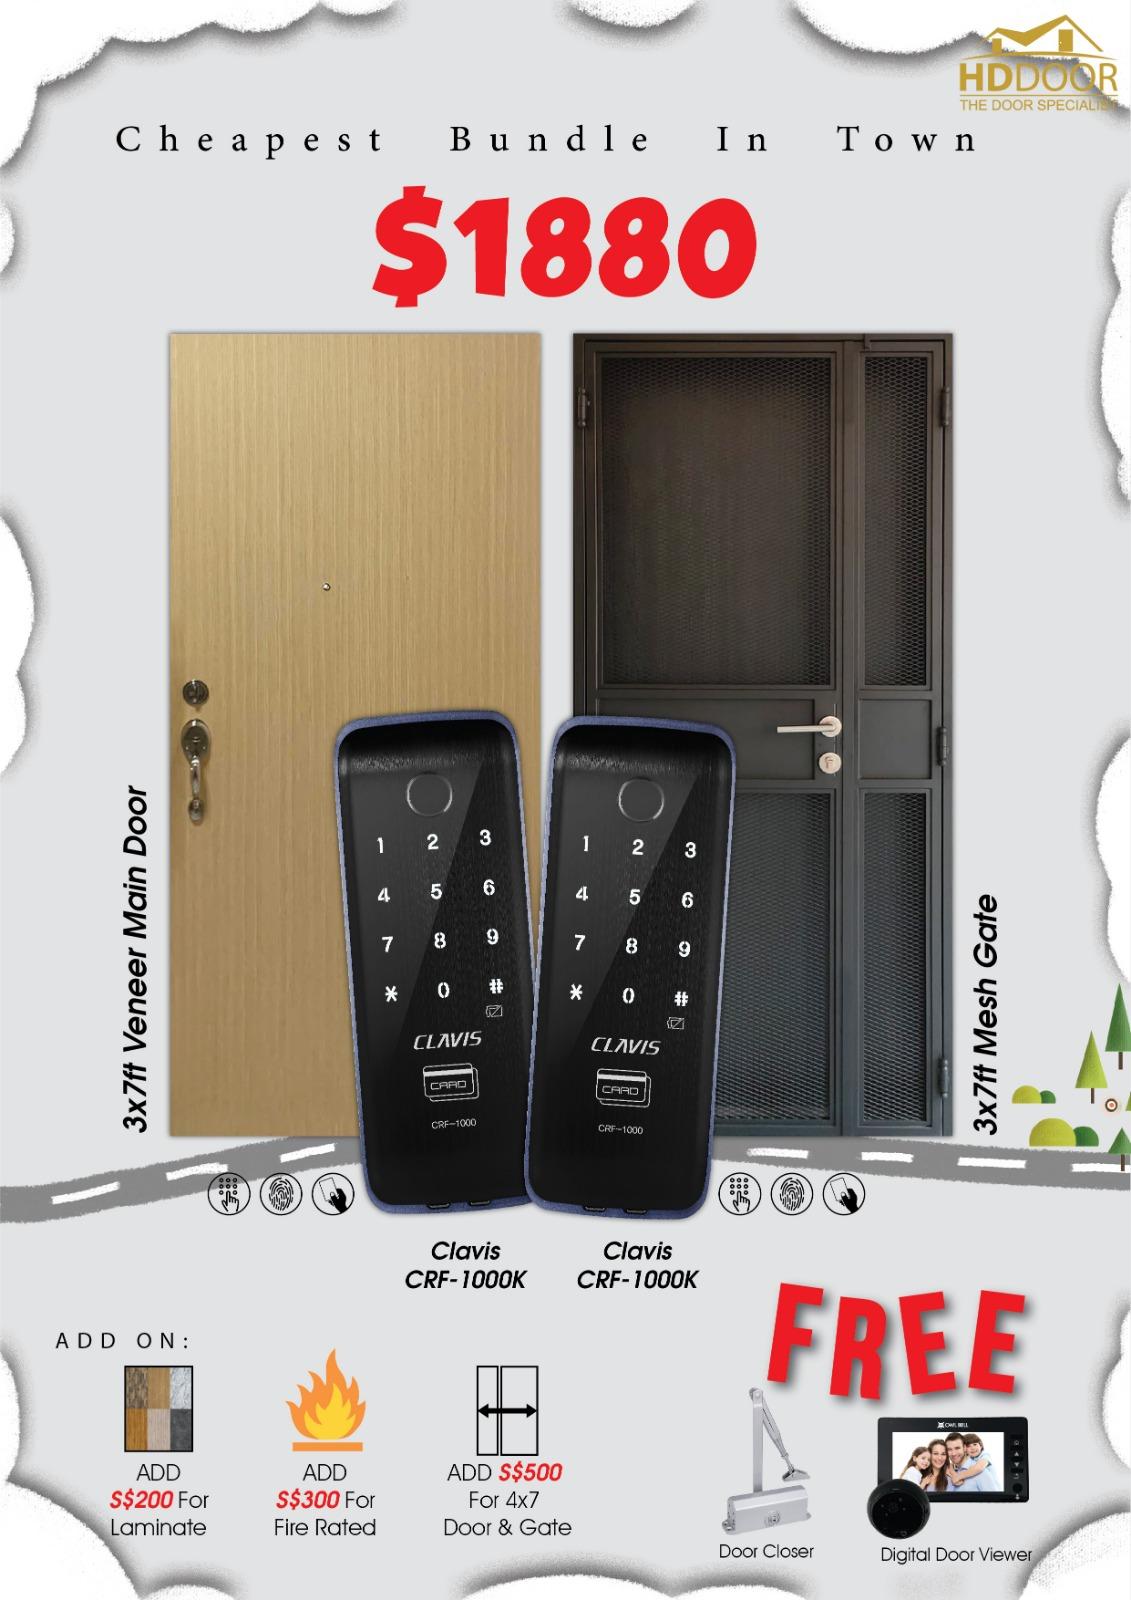 Cheapest Bundle Promotion 2020 | Why Not Deals 1 & Promotions